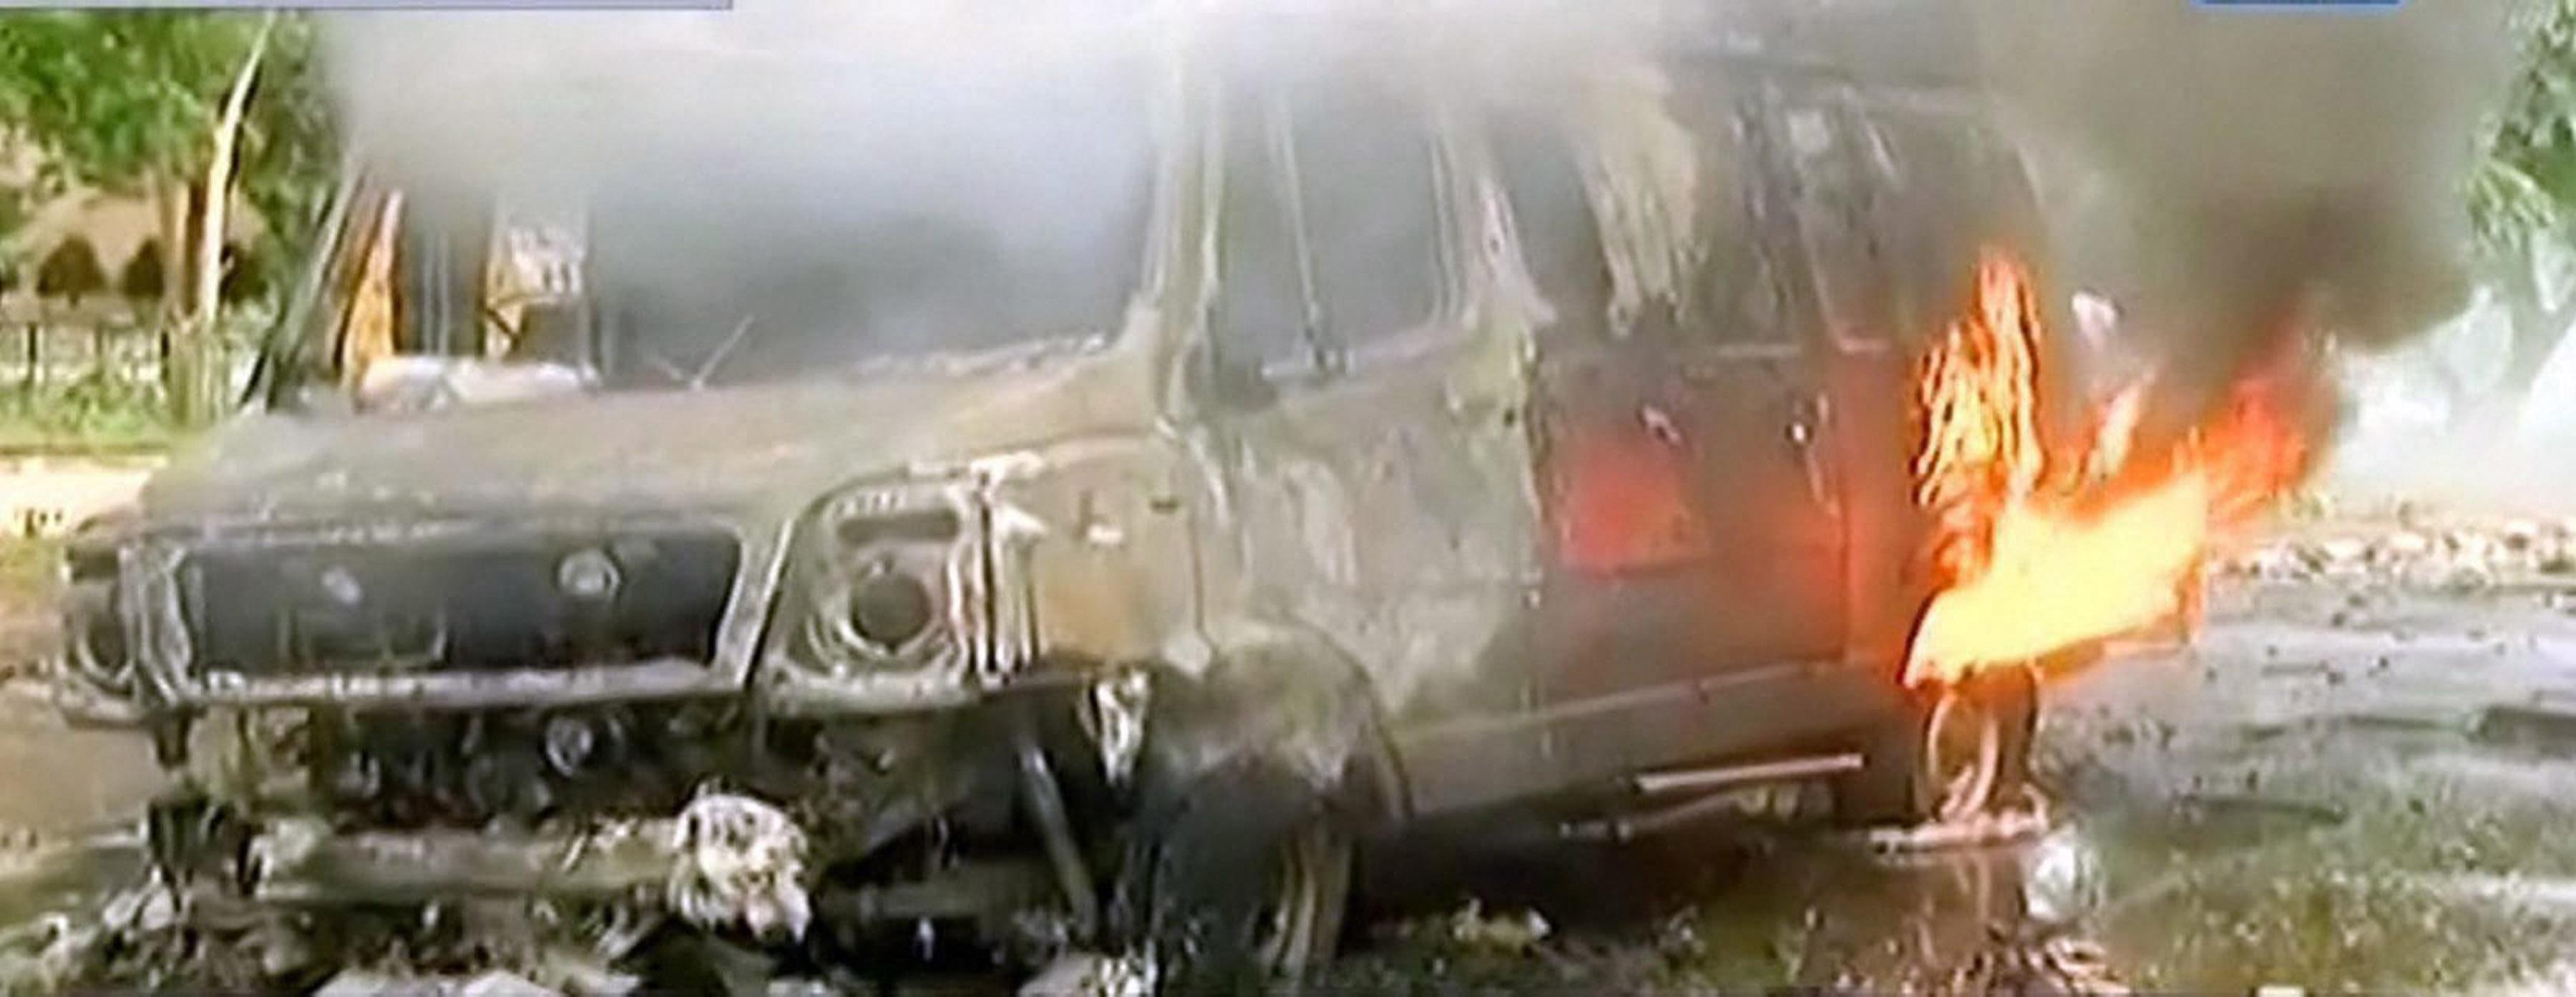 Panchkula: Vehicles burn during arson following Dera Sacha Sauda chief Gurmeet Ram Rahim's conviction in Panchkula on Friday. PTI Photo / TV GRAB AAJ TAK(PTI8_25_2017_000125B)